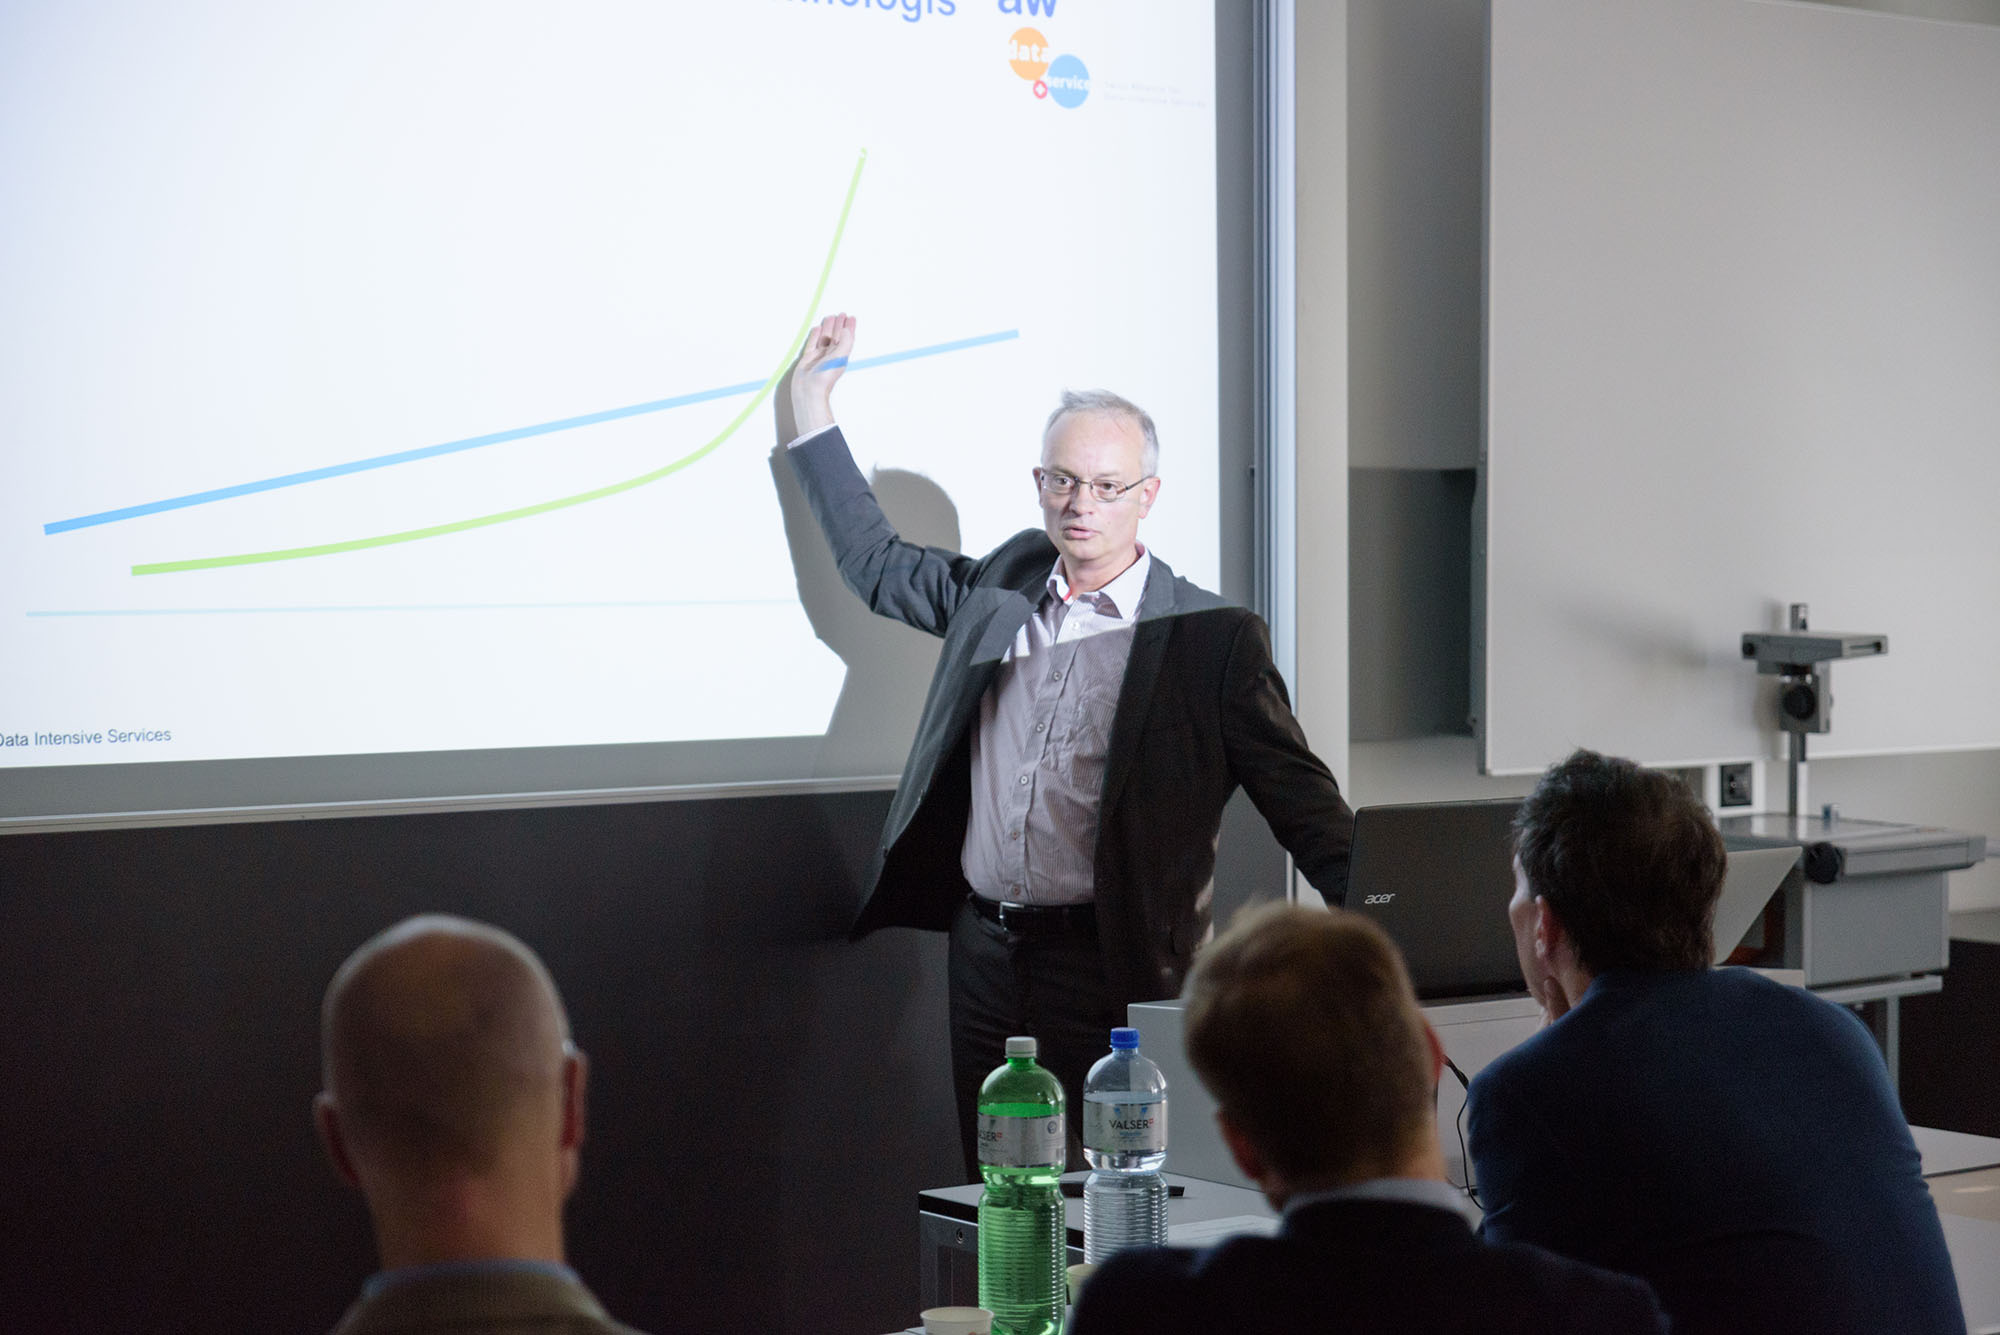 Dr. Jürg Meierhofer, Koordinator ZHAW Plattform Industrie 4.0, ZHAW School of Engineering, Swiss Alliance for Data-Intensive Services